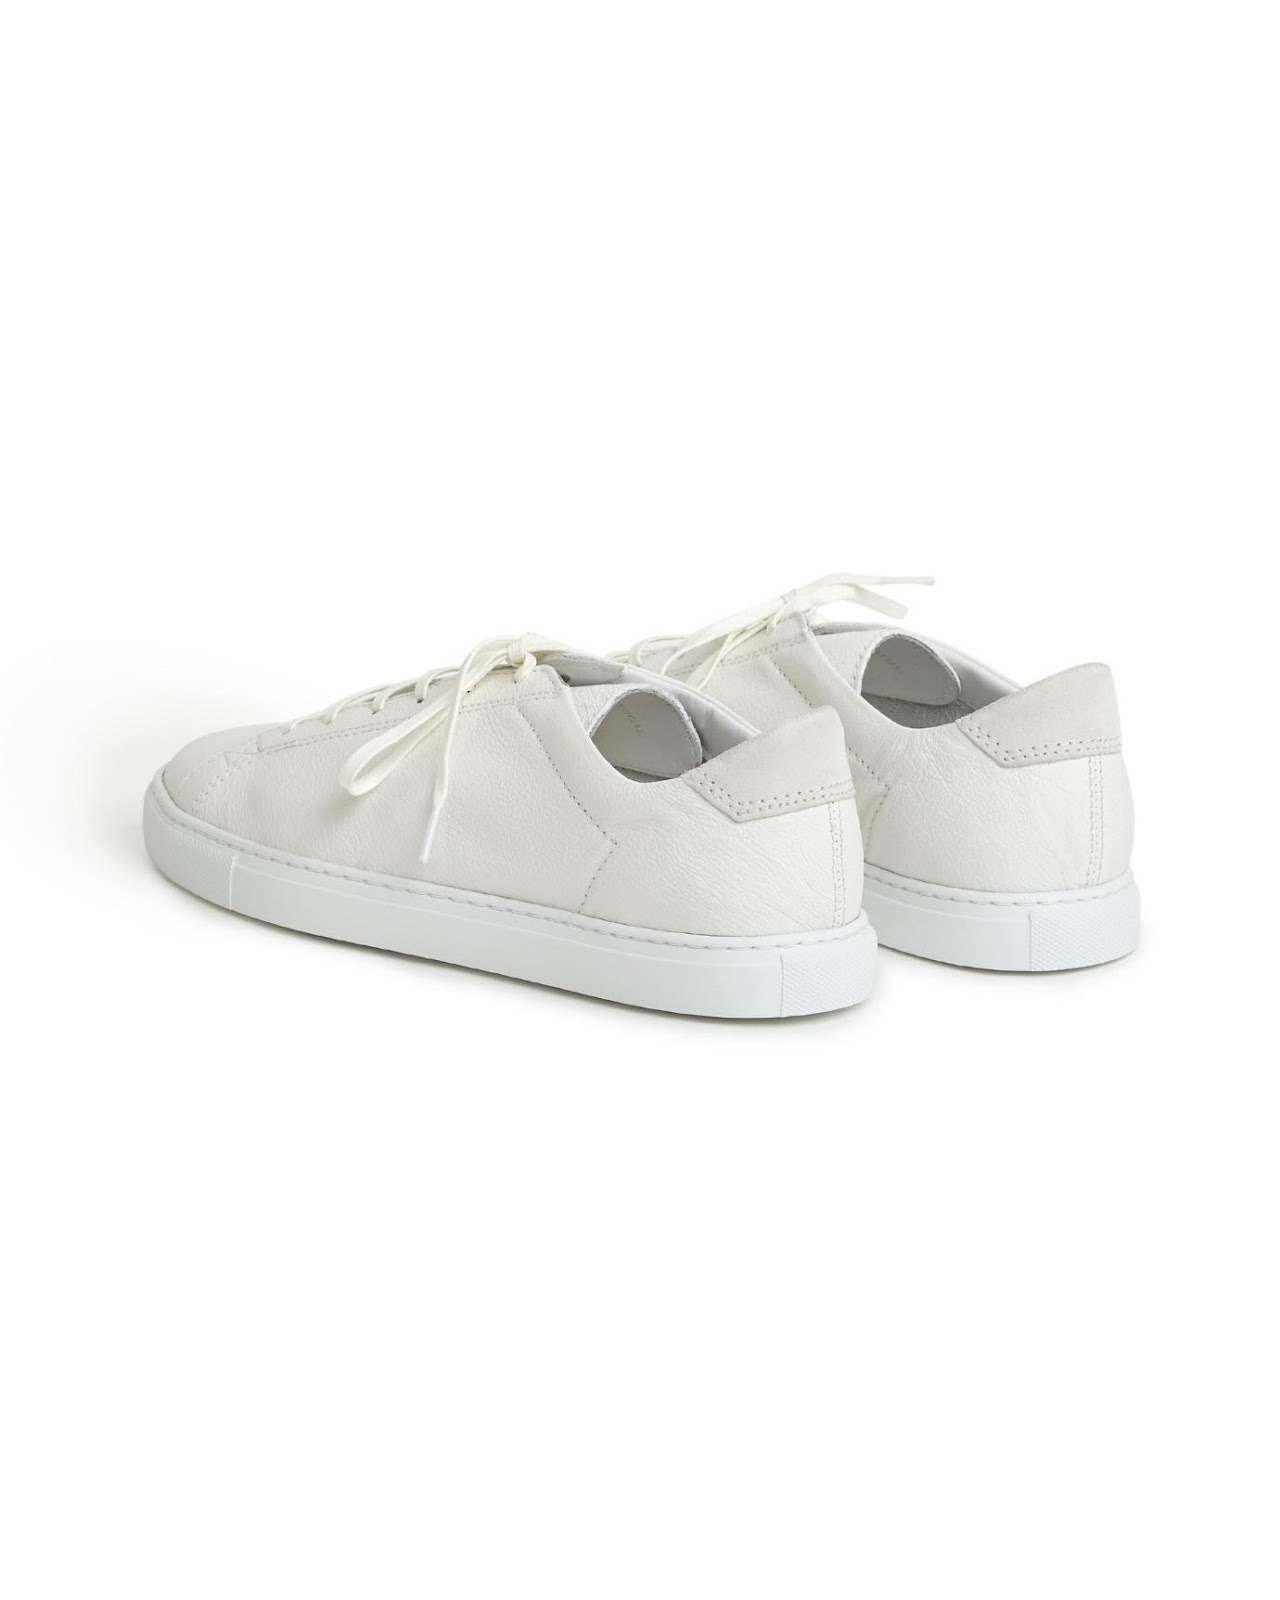 """CQP Racquet Sneaker White Leather"" รองเท้ามินิมอลสไตล์สแกนดิเนเวียน 03"